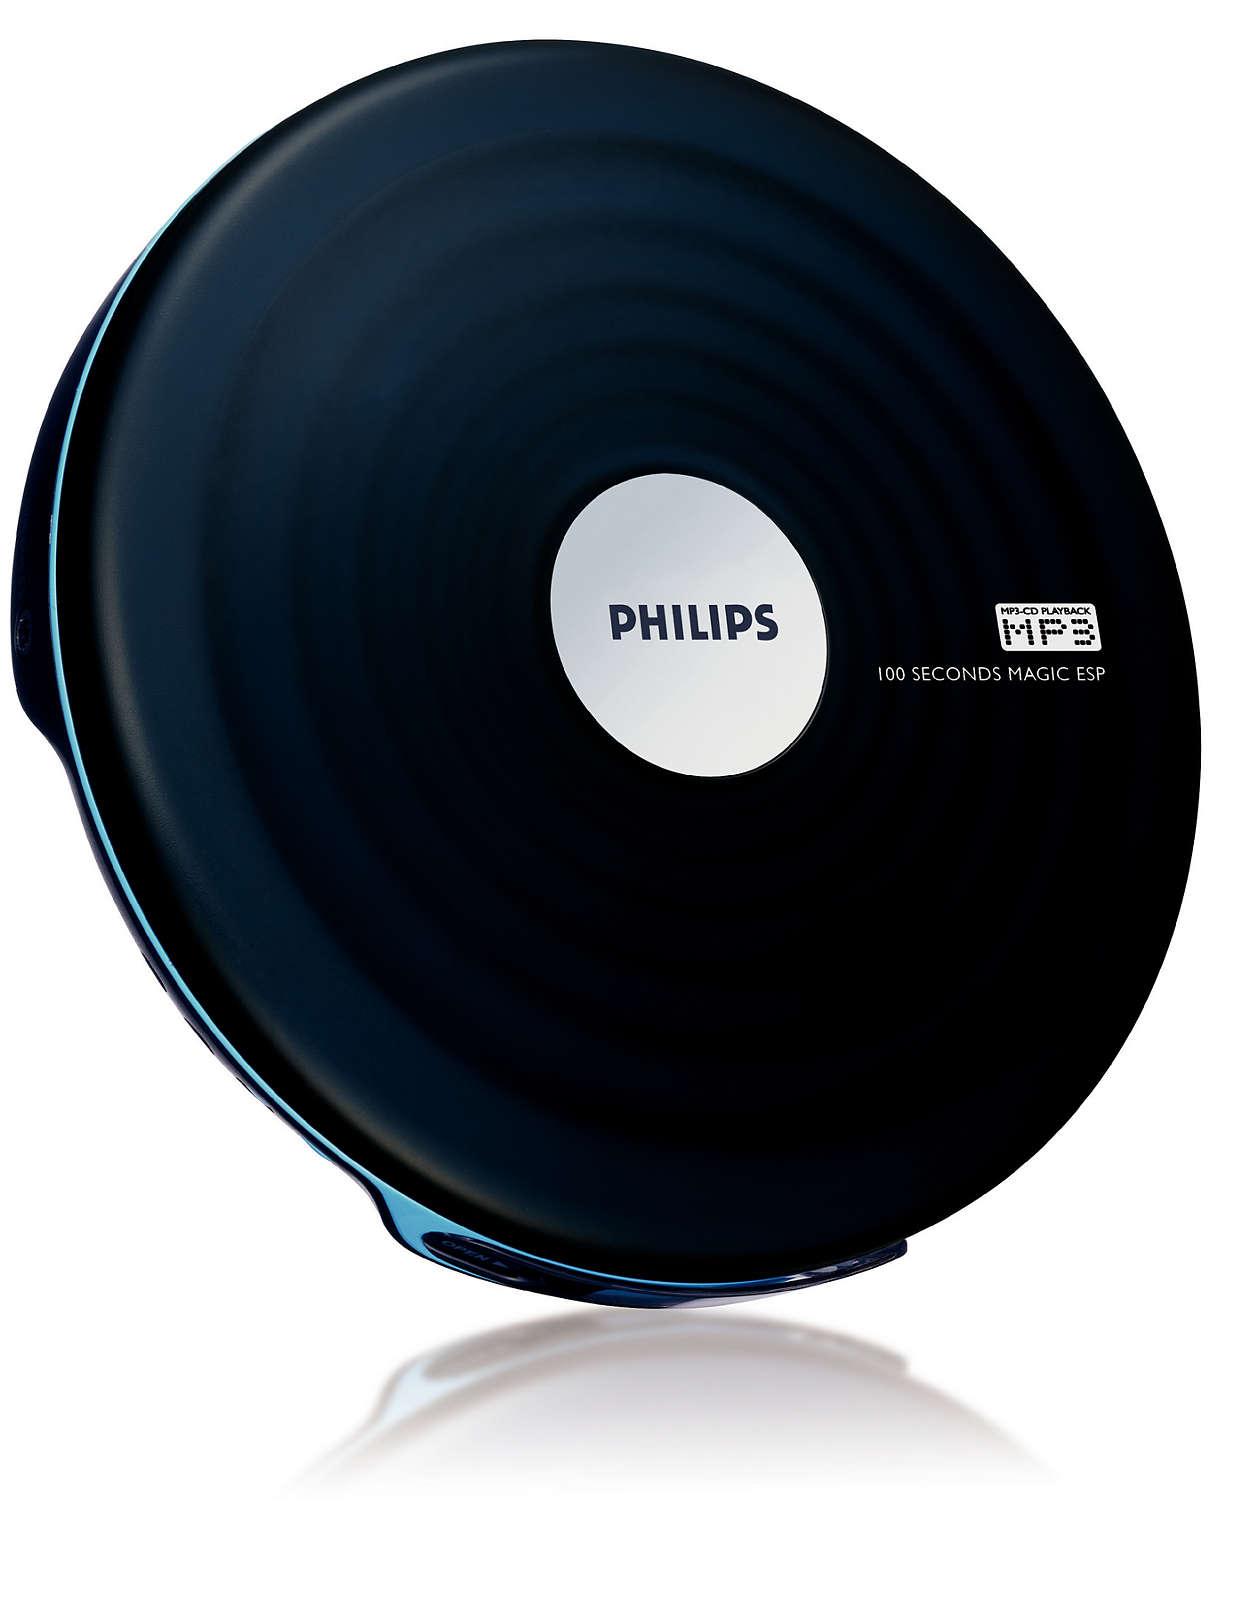 Enjoy skip-free MP3 music